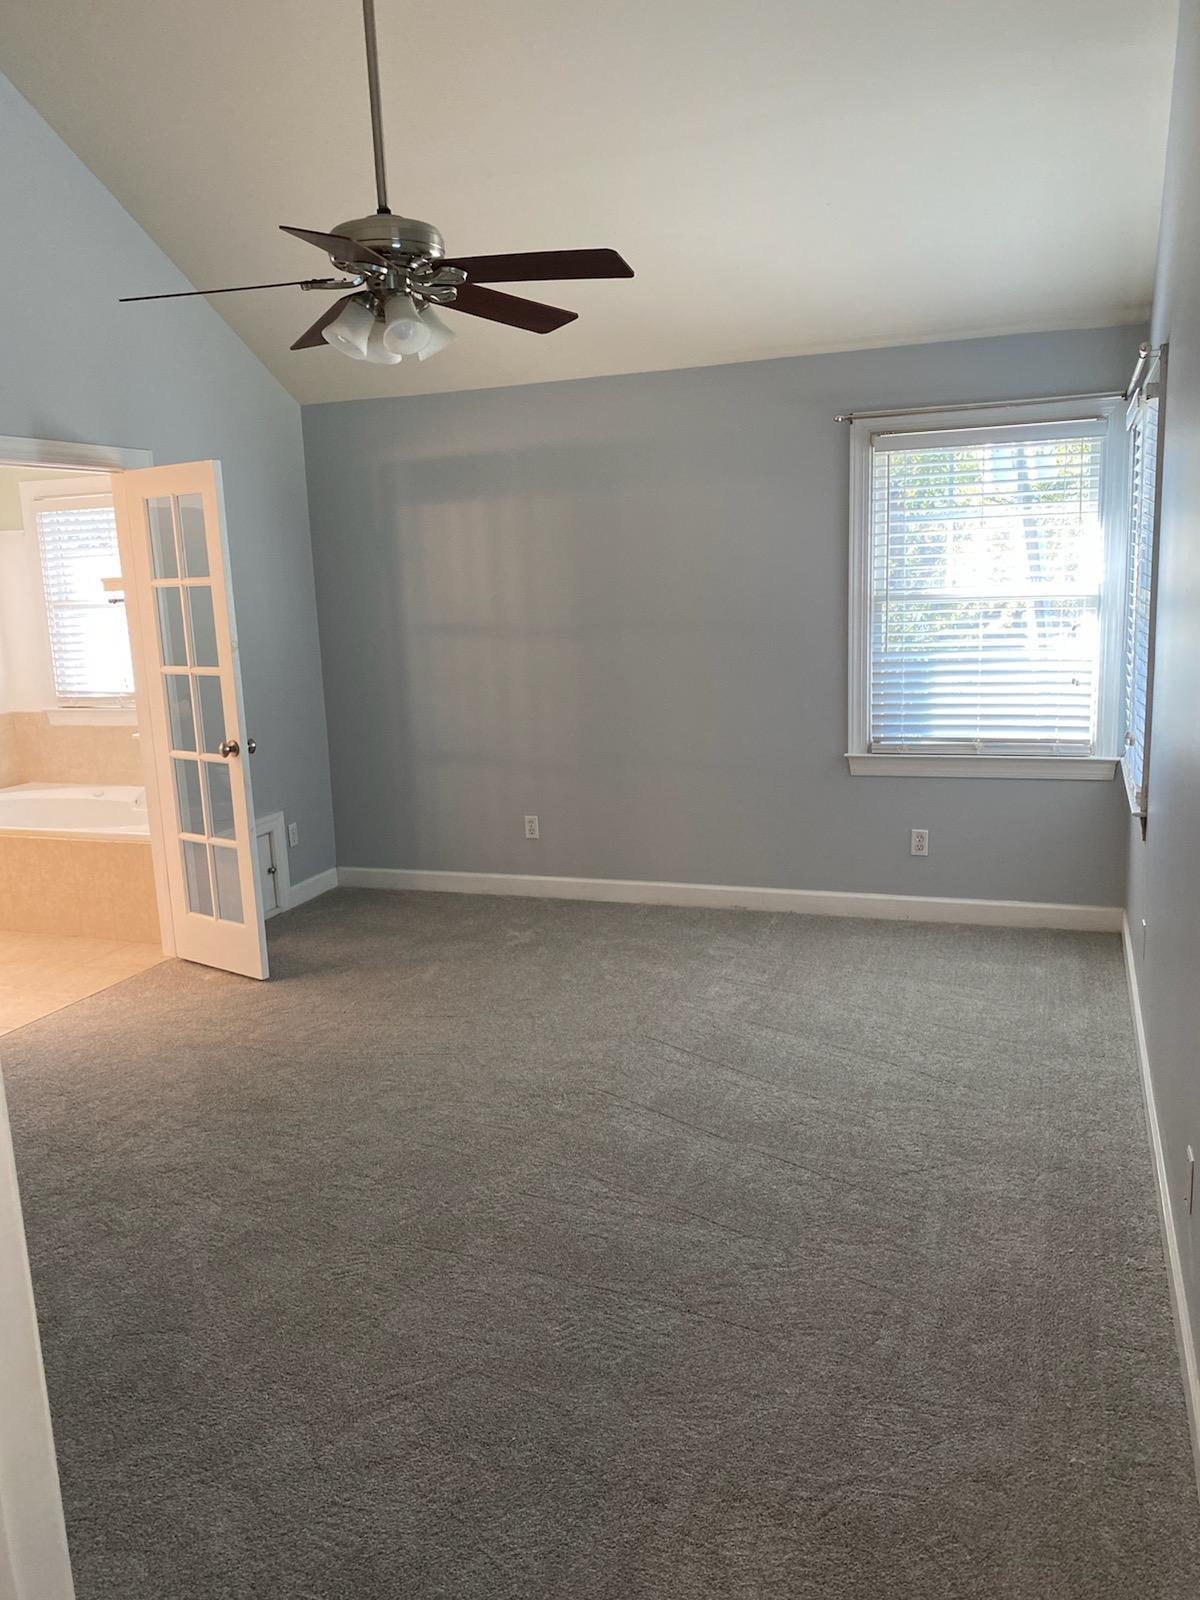 Laurel Lakes Homes For Sale - 1305 Woodlock, Mount Pleasant, SC - 1